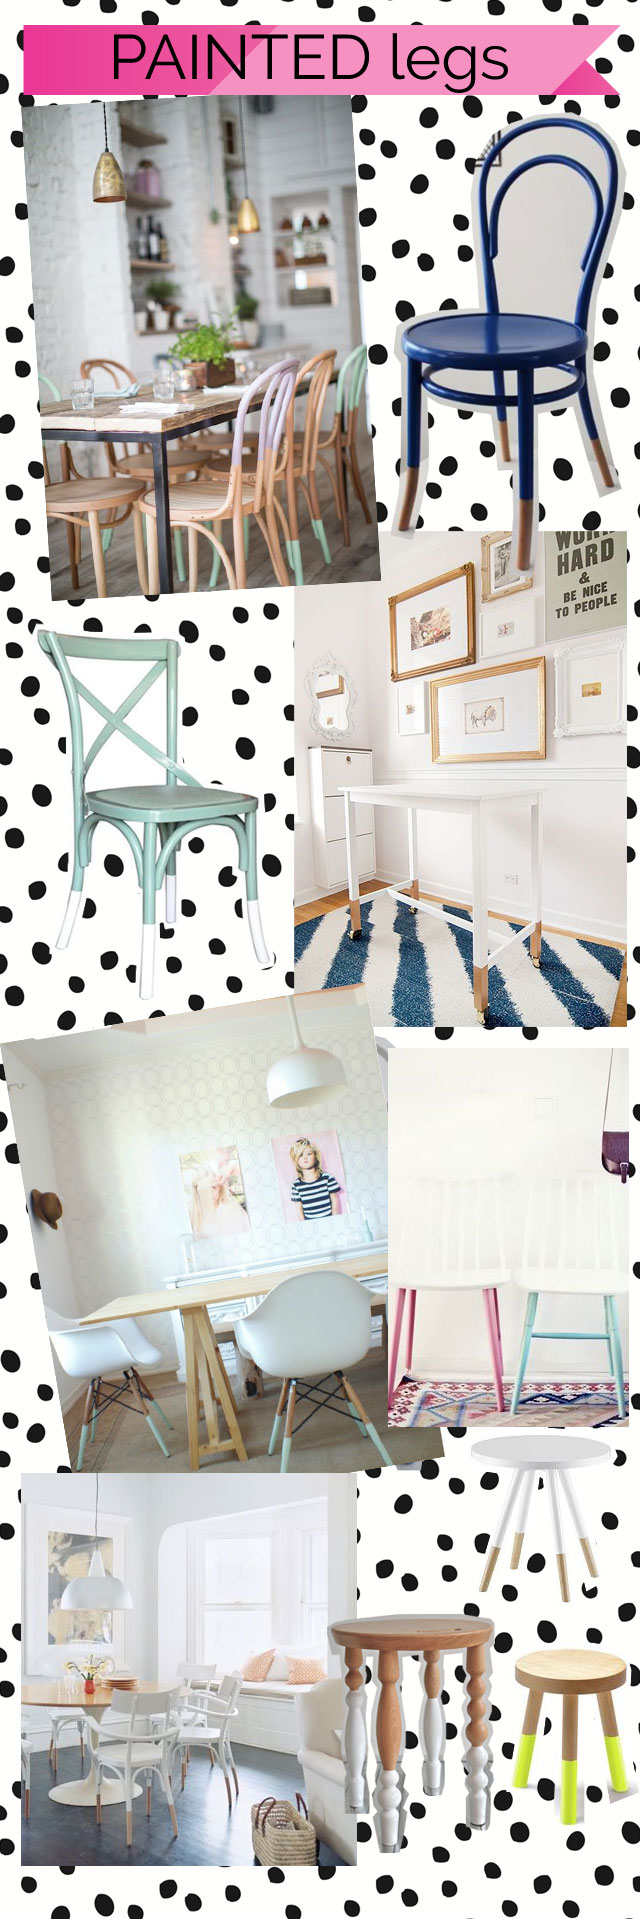 painted-legs-dipped-legs-furniture